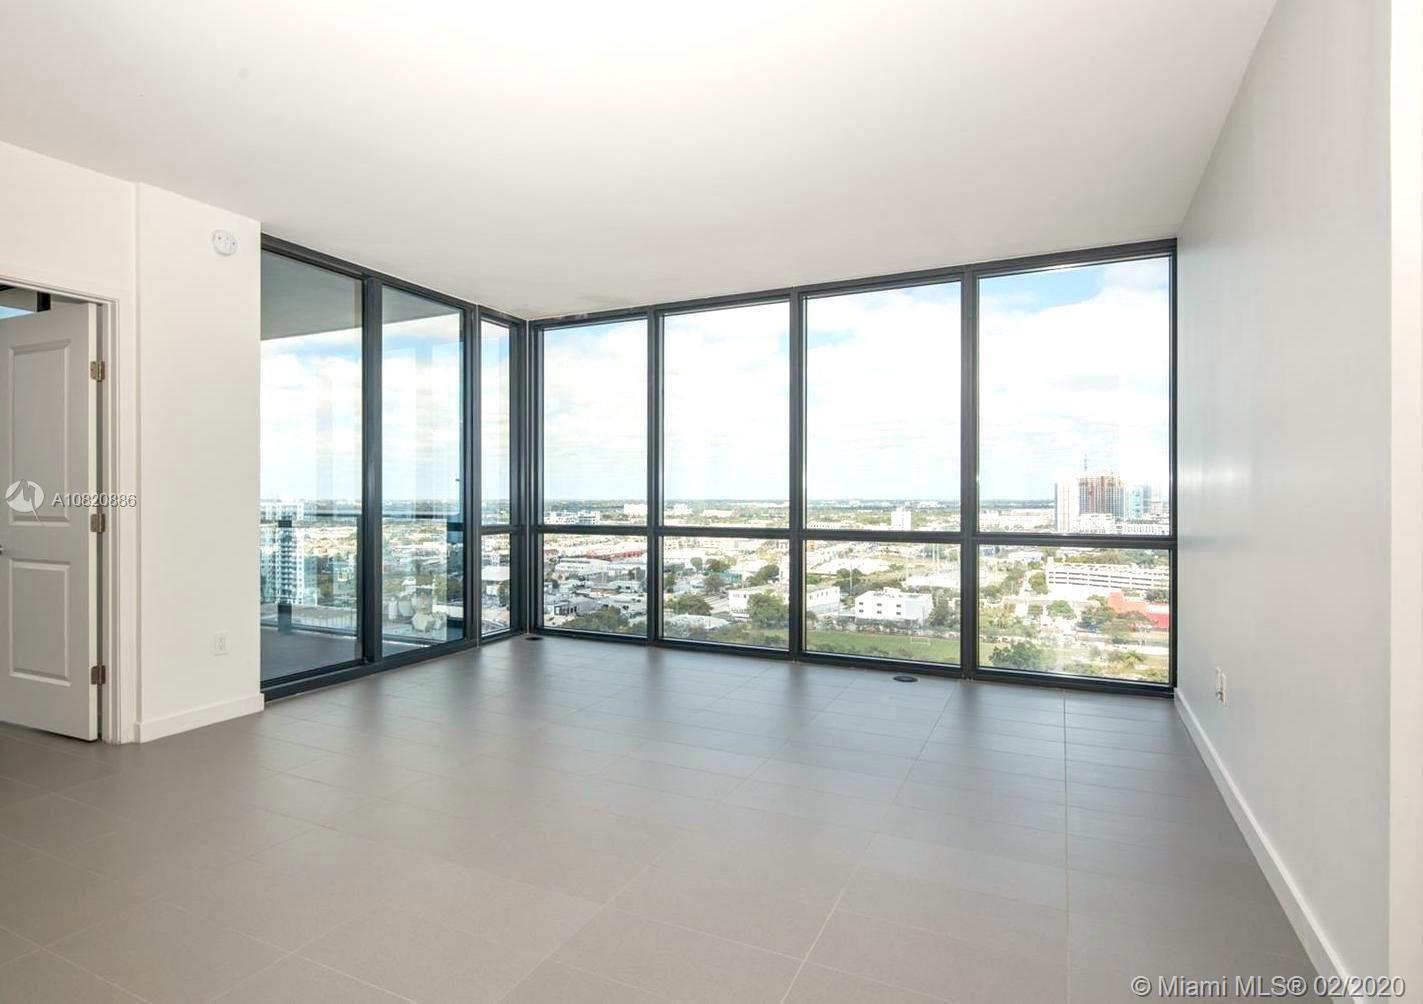 Photo of 1600 NE 1st Ave #1816, Miami, FL 33132 (MLS # A10820886)